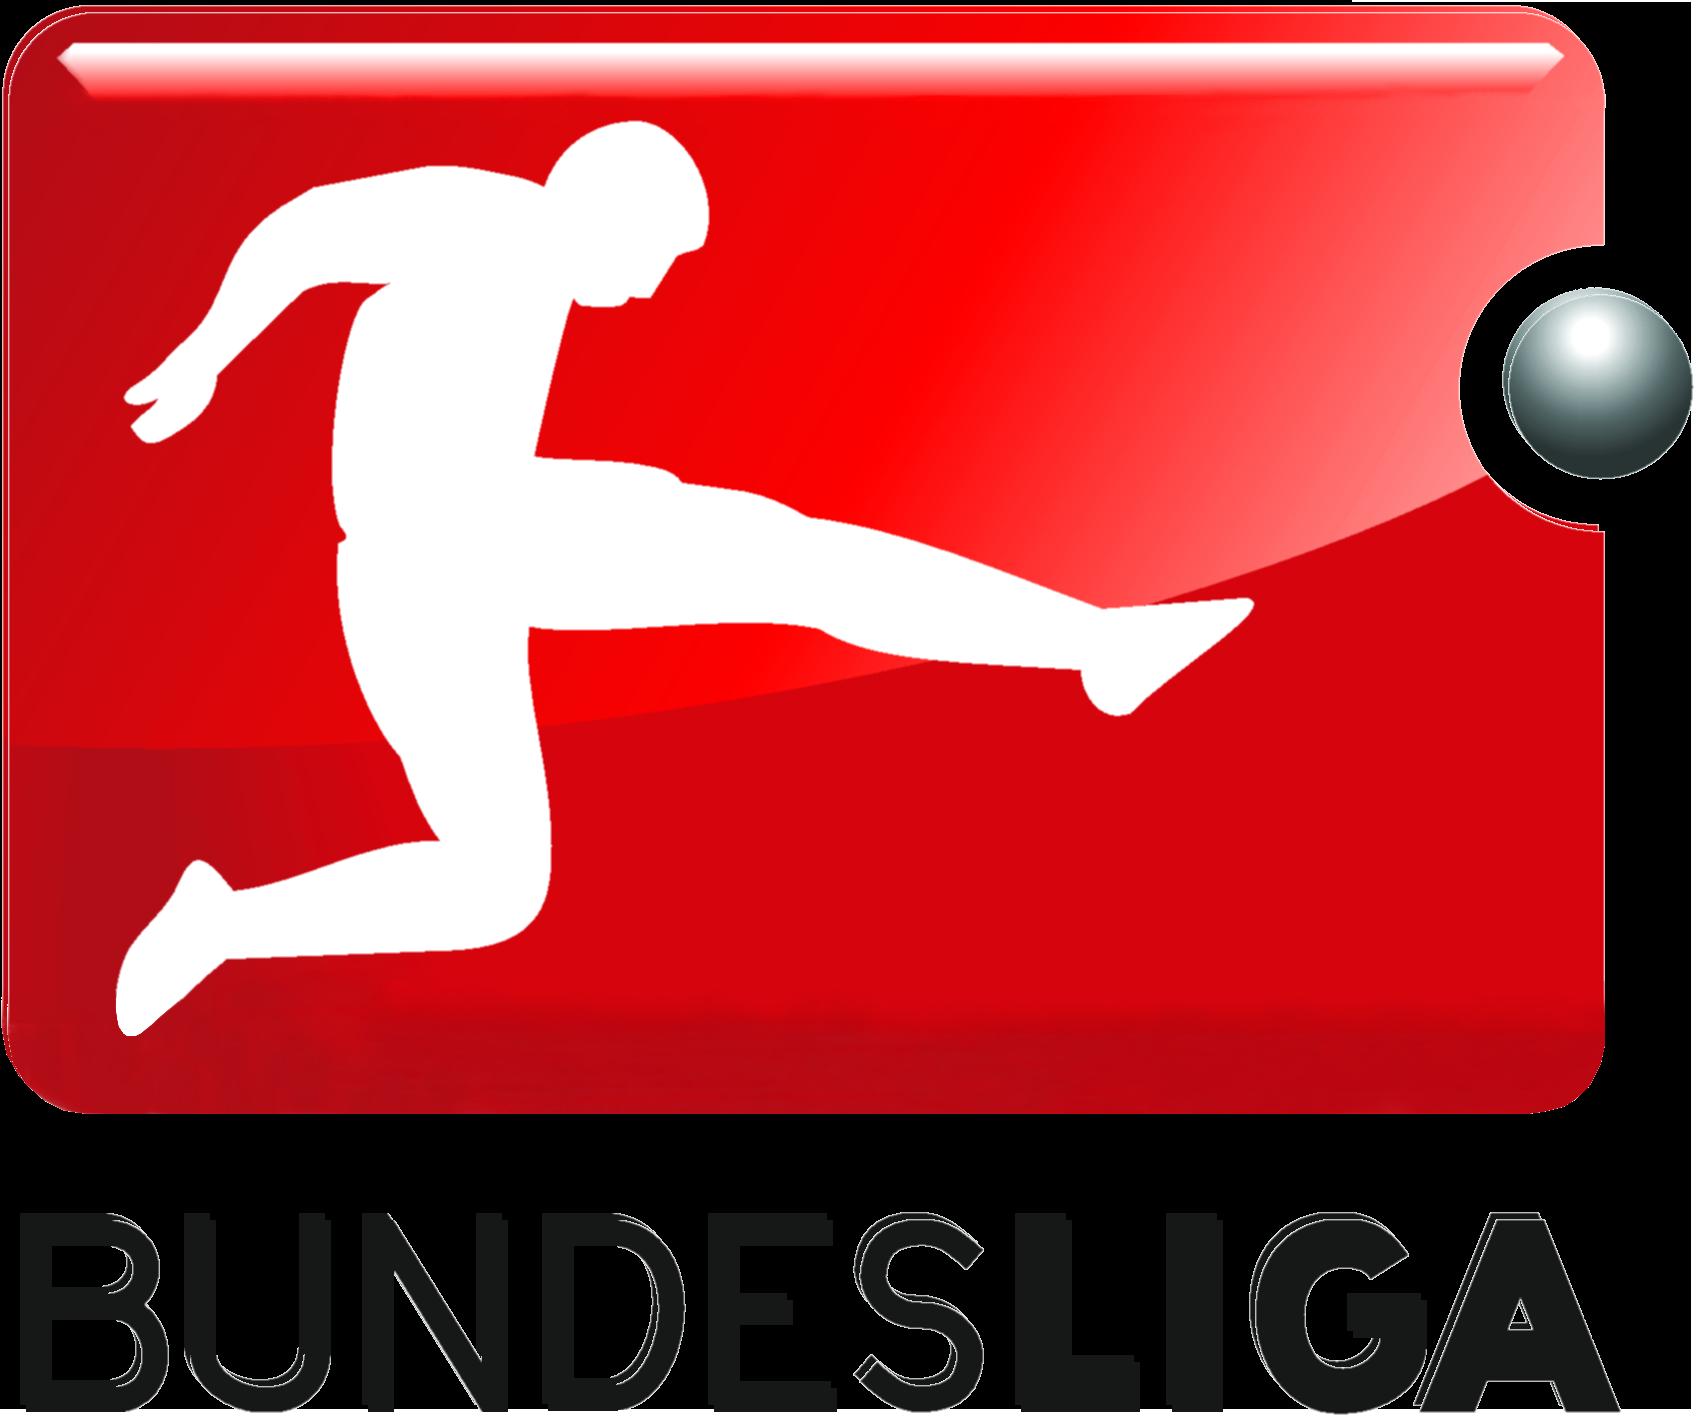 Image Result For Bundesliga Sumary